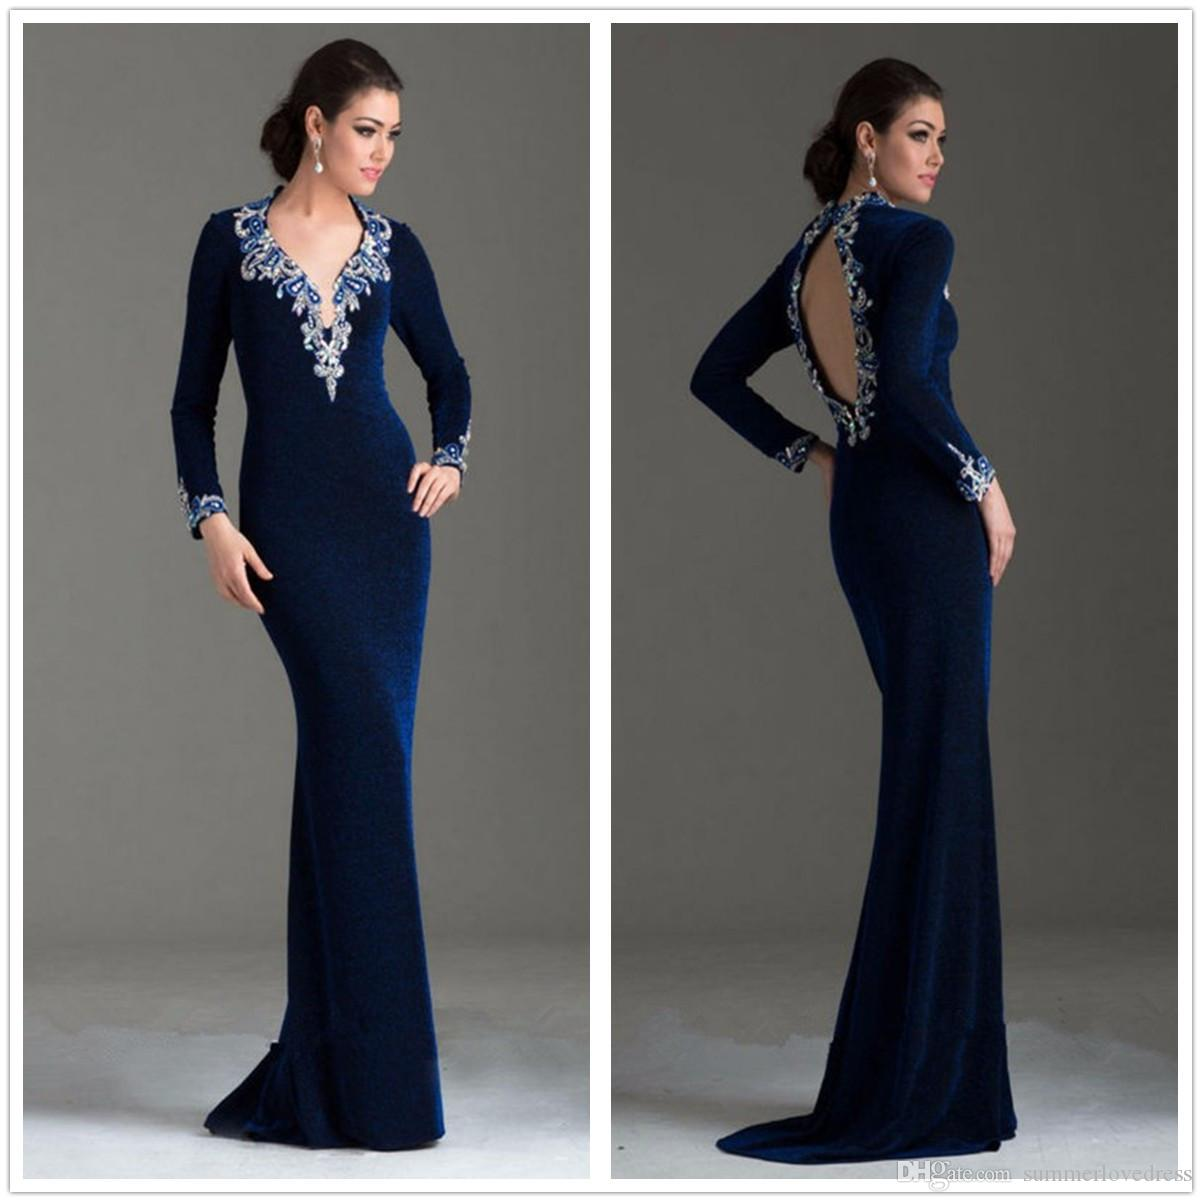 fa5e35b6a12 2017 New Navy Blue Long Sleeves Velvet Mermaid Evening Dresses V Neck  Beaded Stones Backless Sweep Train Party Prom Dresses Red Evening Dress  Shop Dresses ...